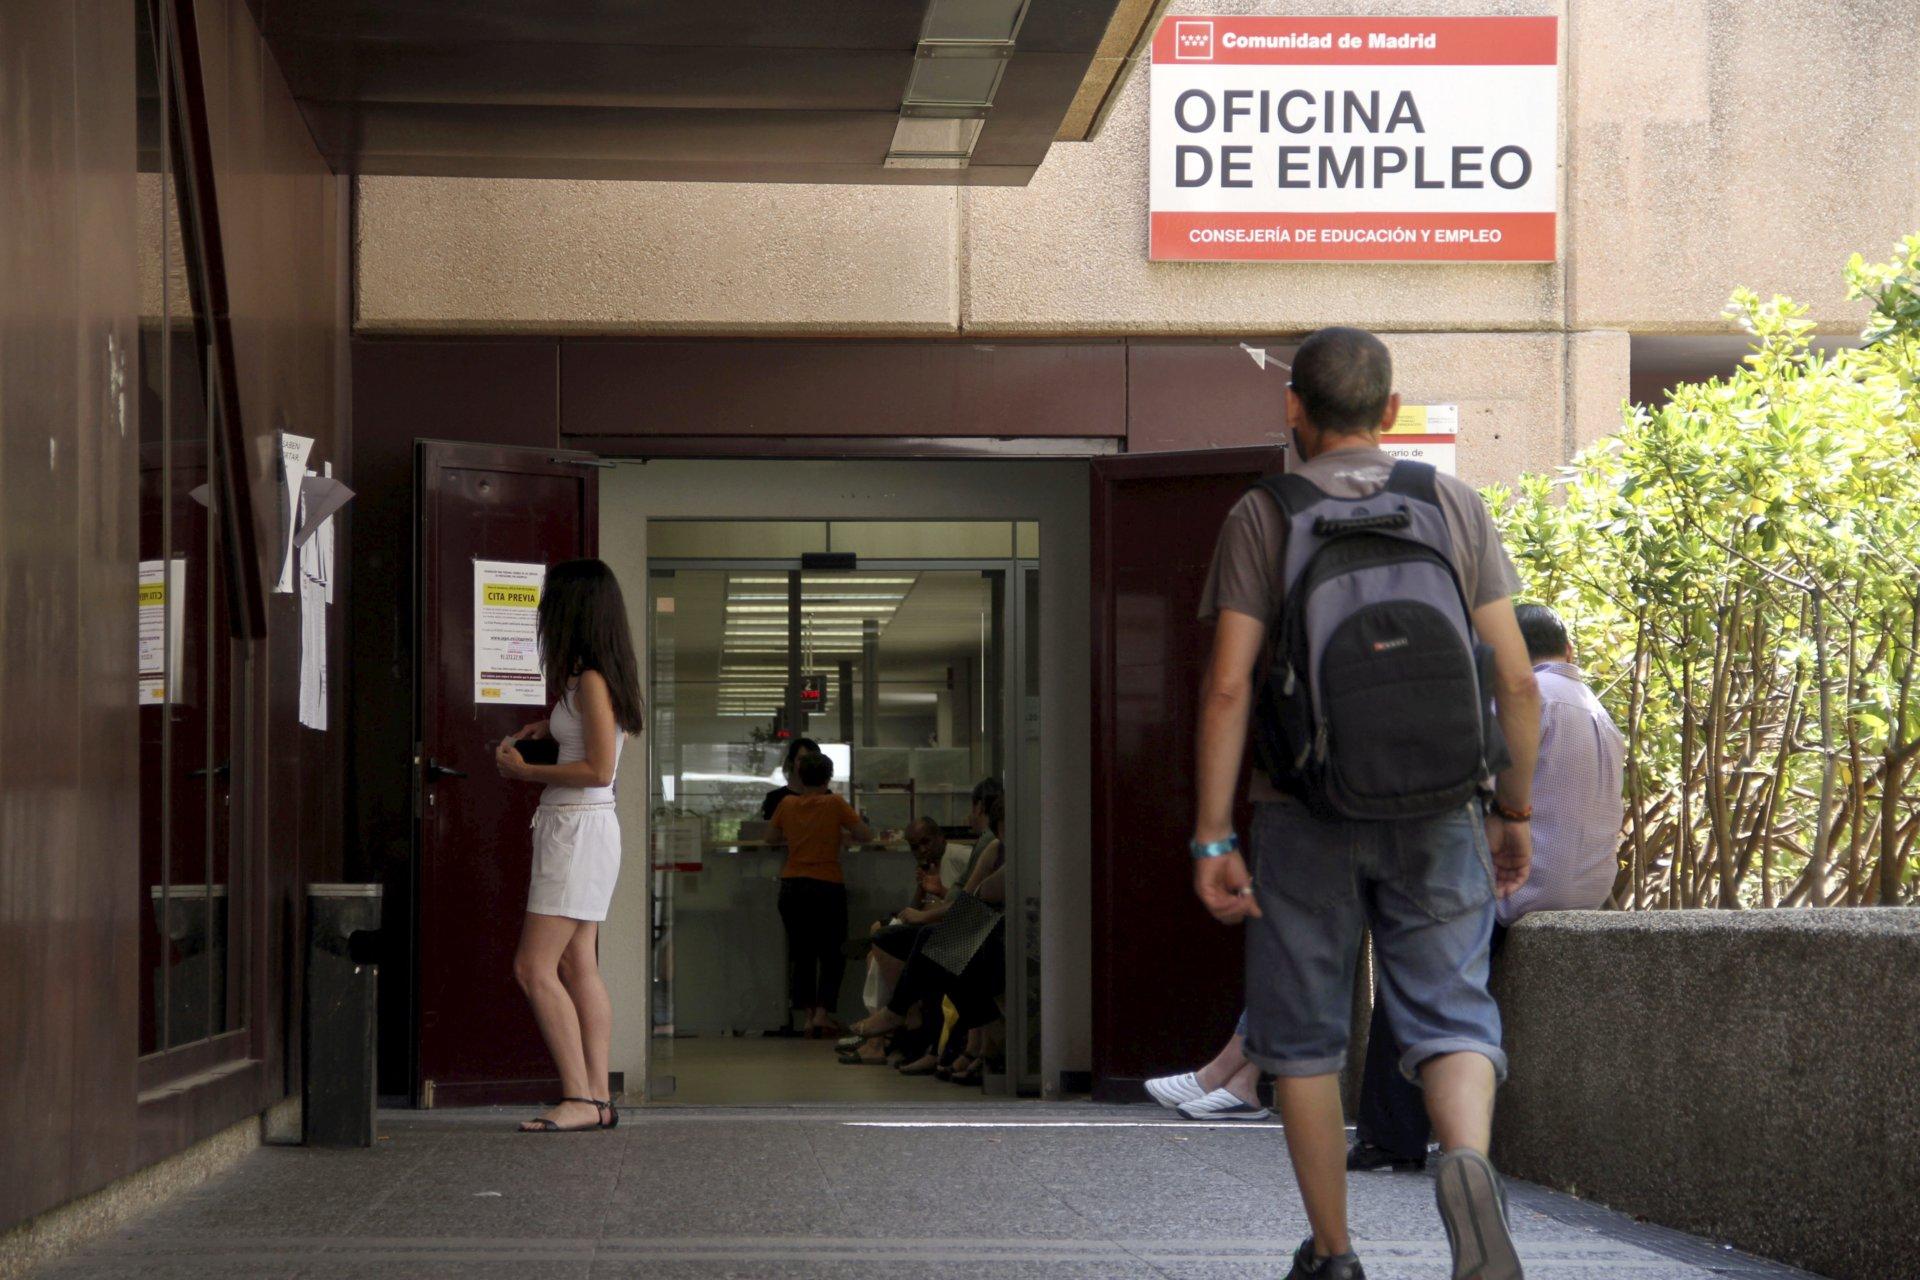 C mo afectan los periodos de desempleo a la pensi n for Oficina empleo madrid